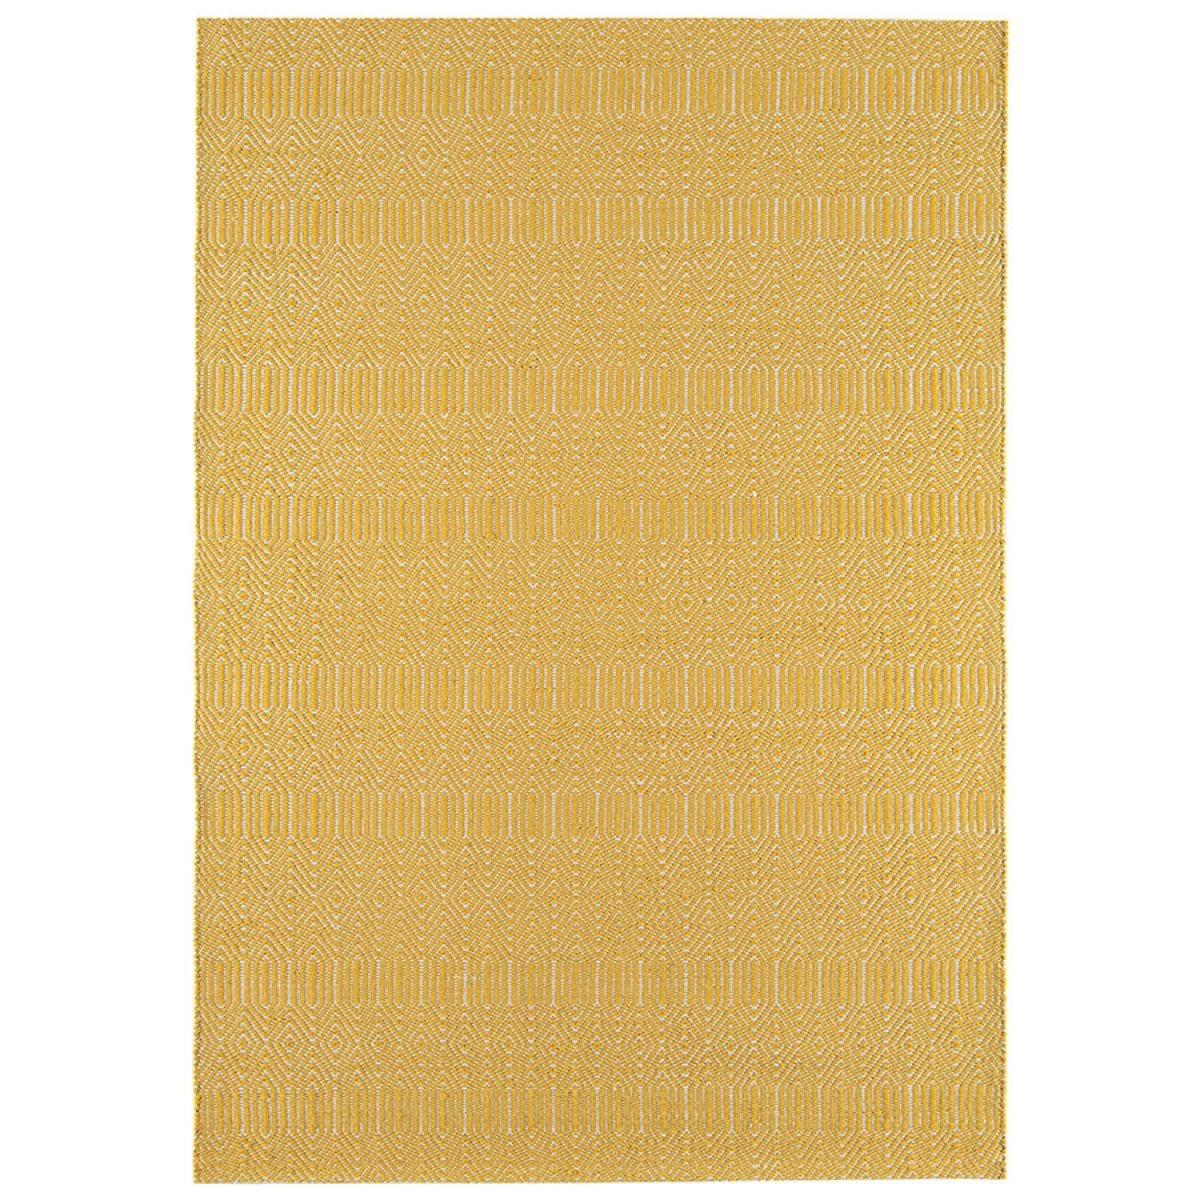 Asiatic Sloan Rug, 200 x 300cm - Mustard